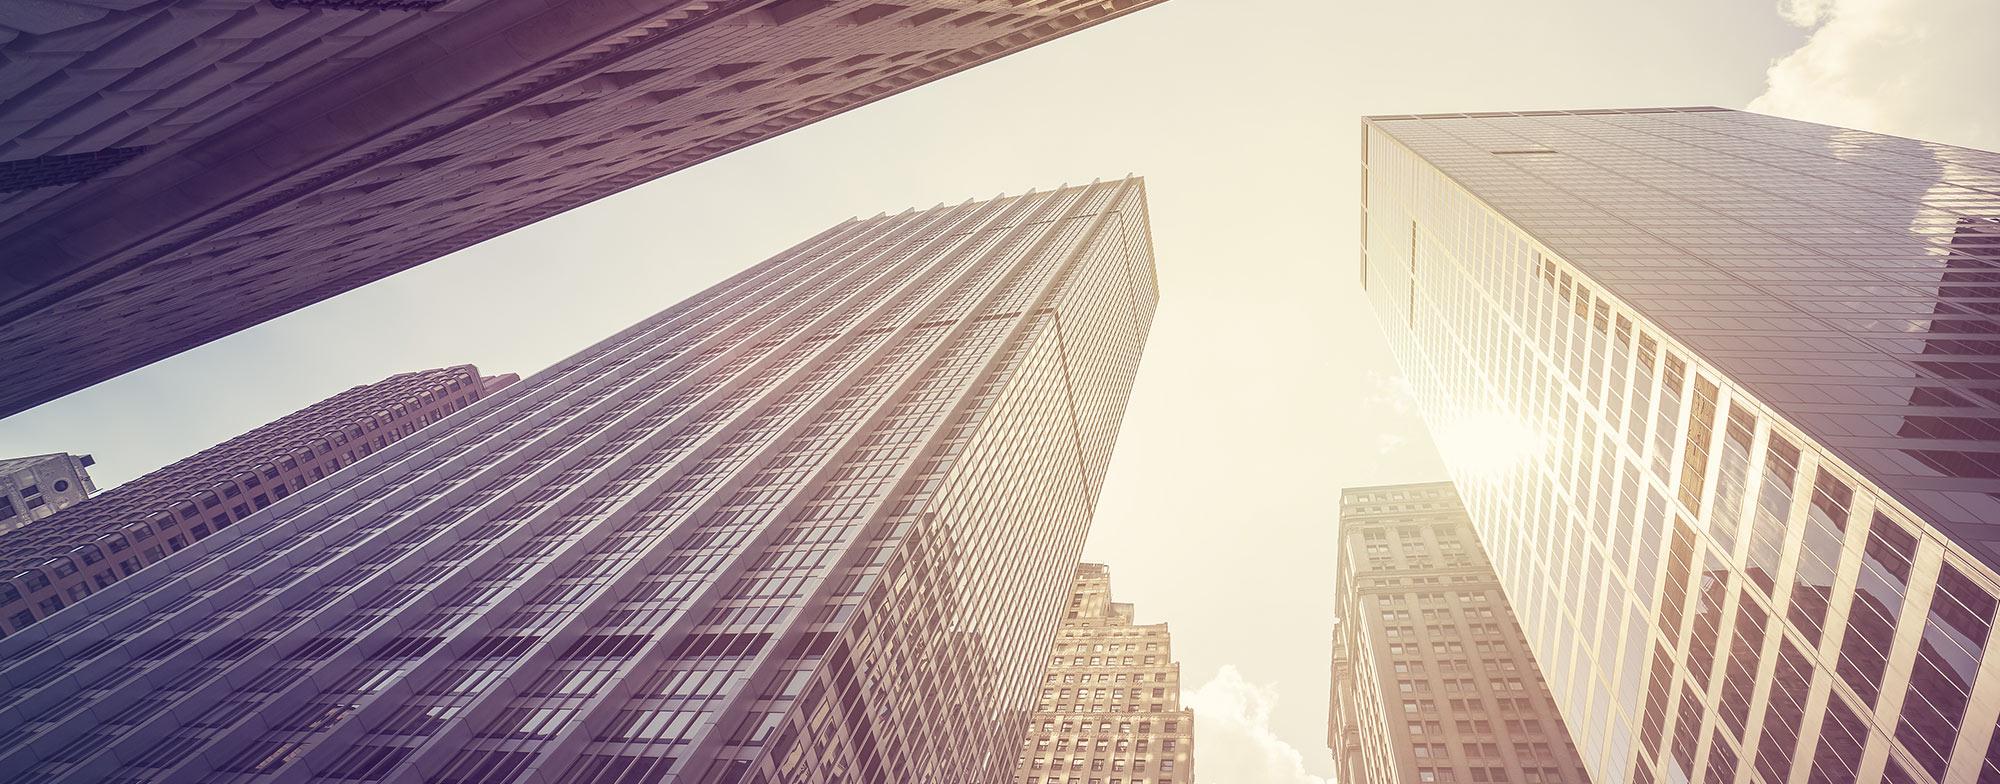 Exklusive Immobilieninvestition Entwicklung - Asset Management